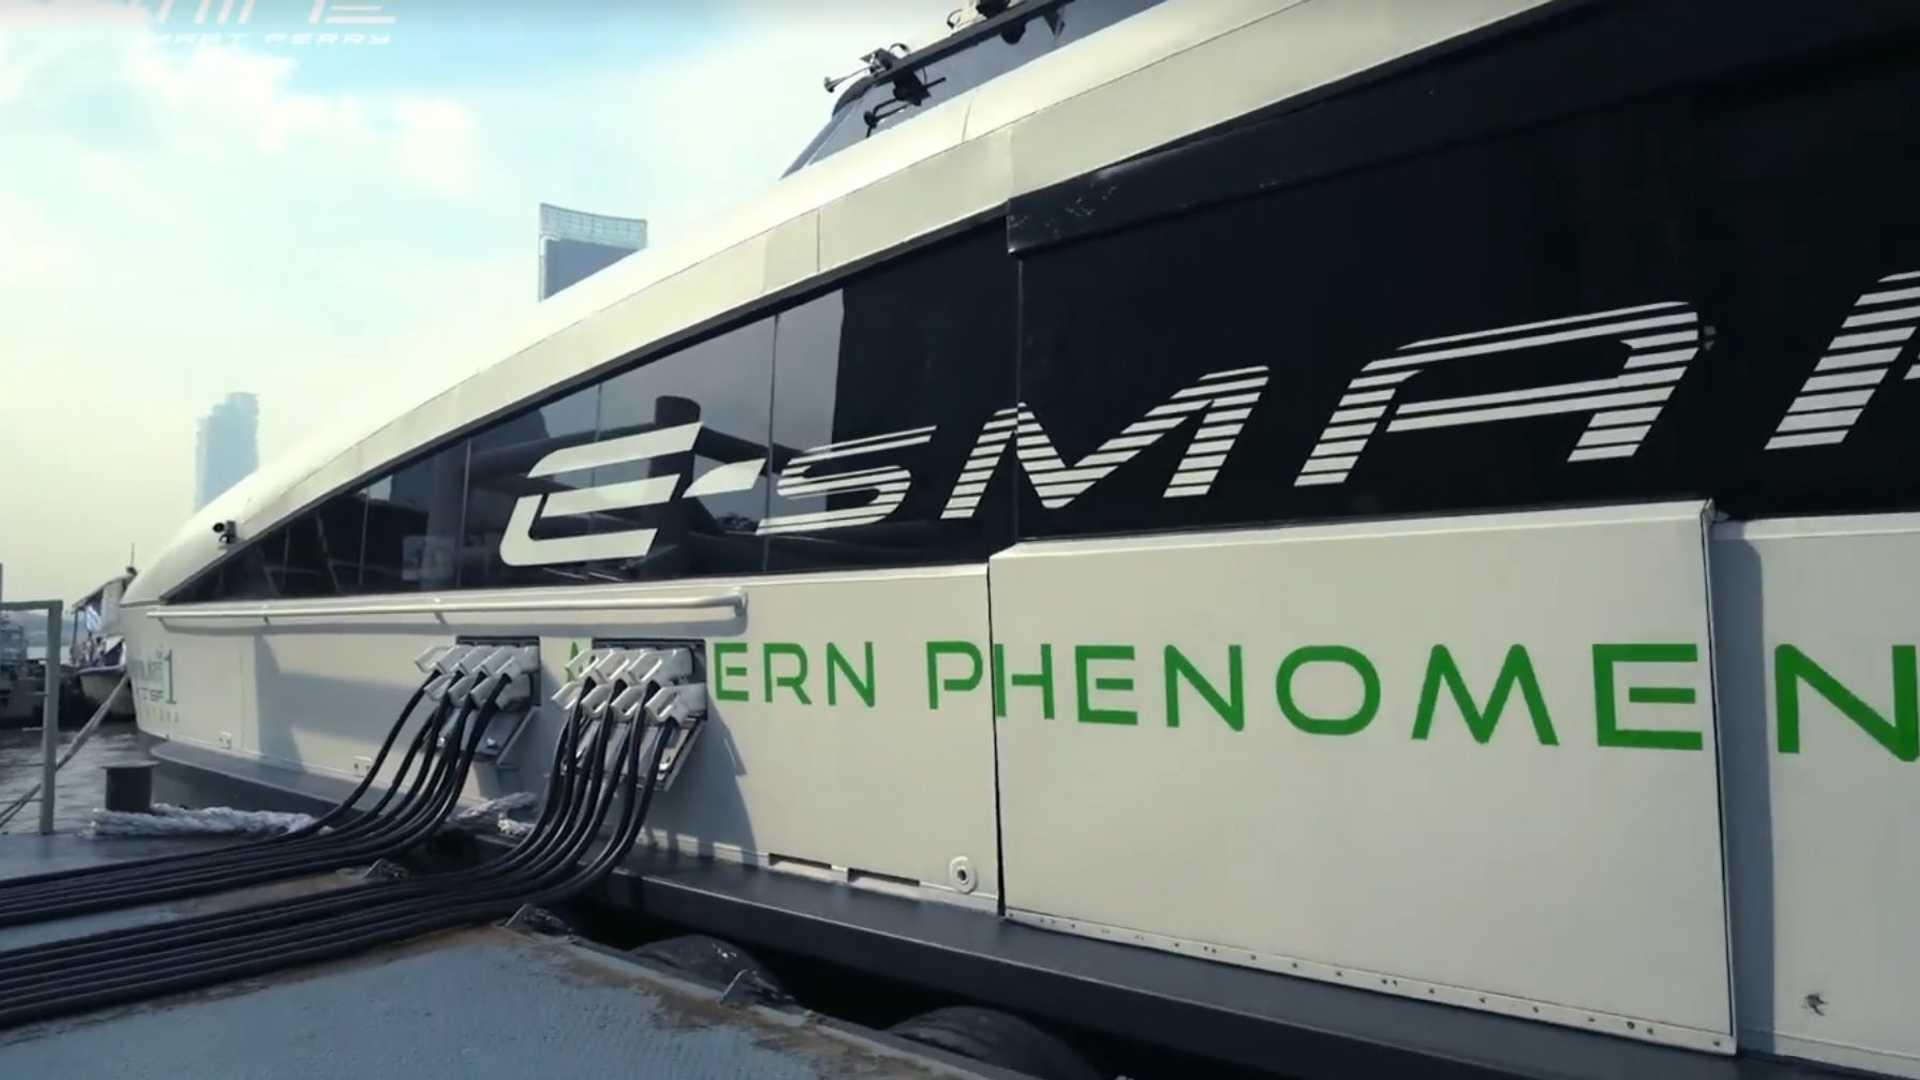 mine-smart-ferry---fast-charging-inlets-plugs.jpg